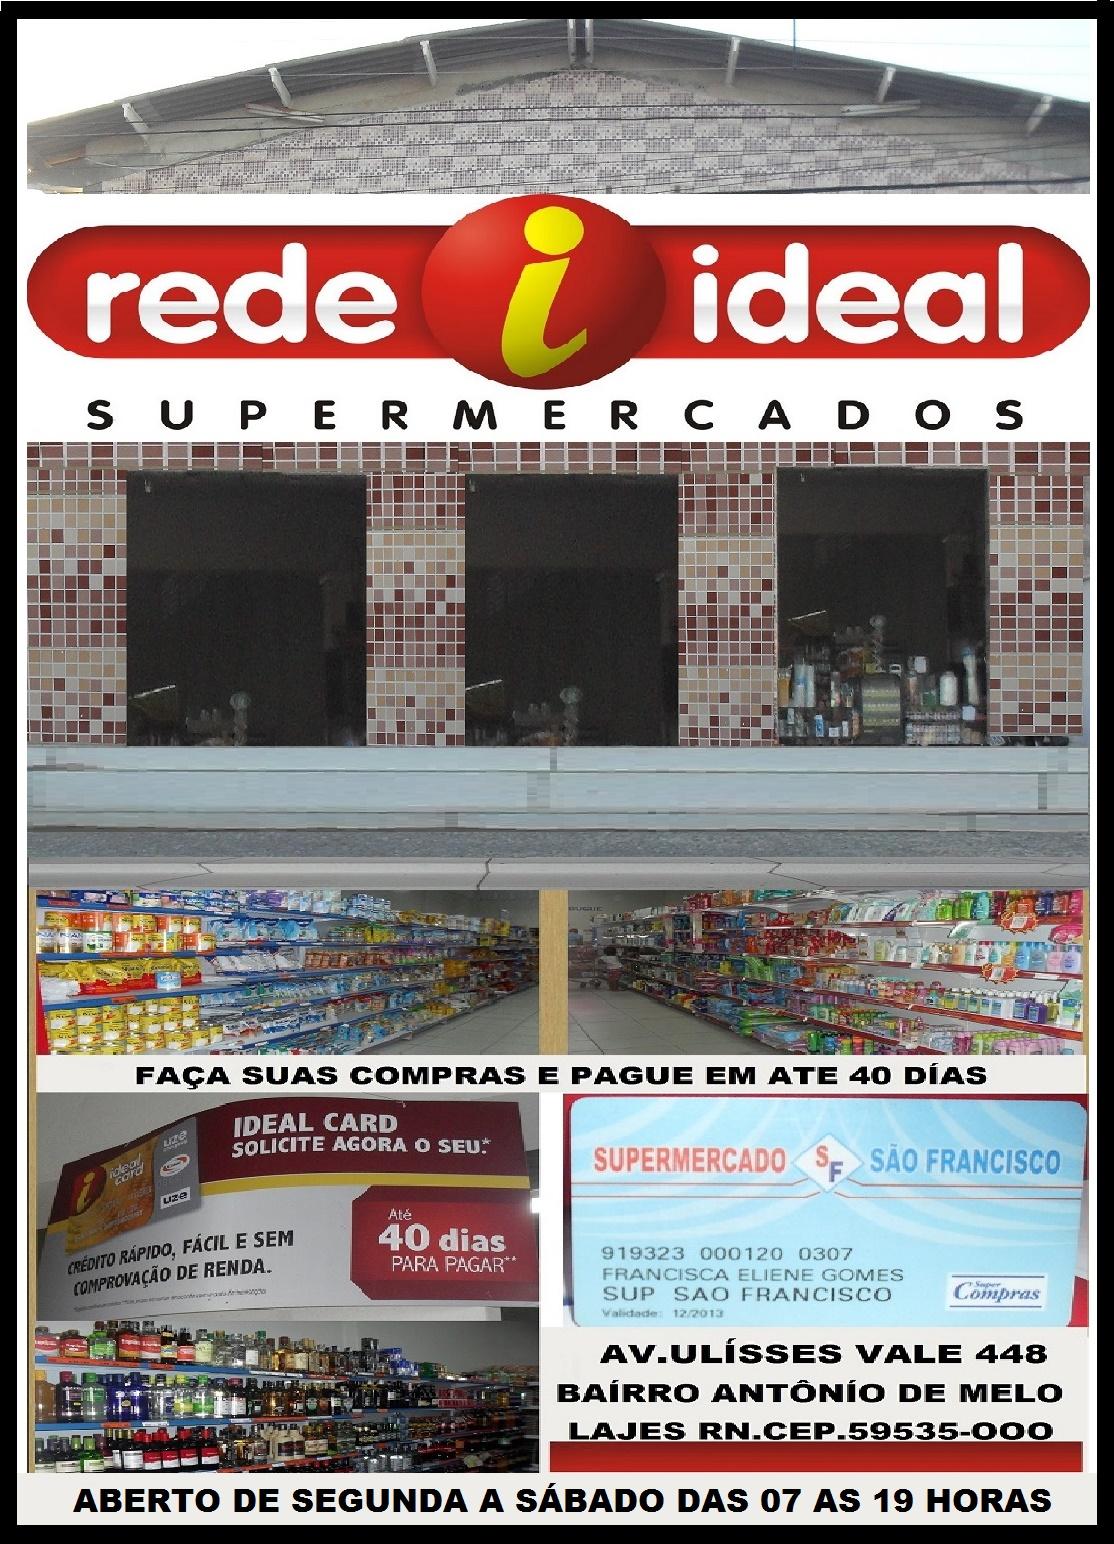 REDE ÍDEAL SUPERMERCADO LAJES RN